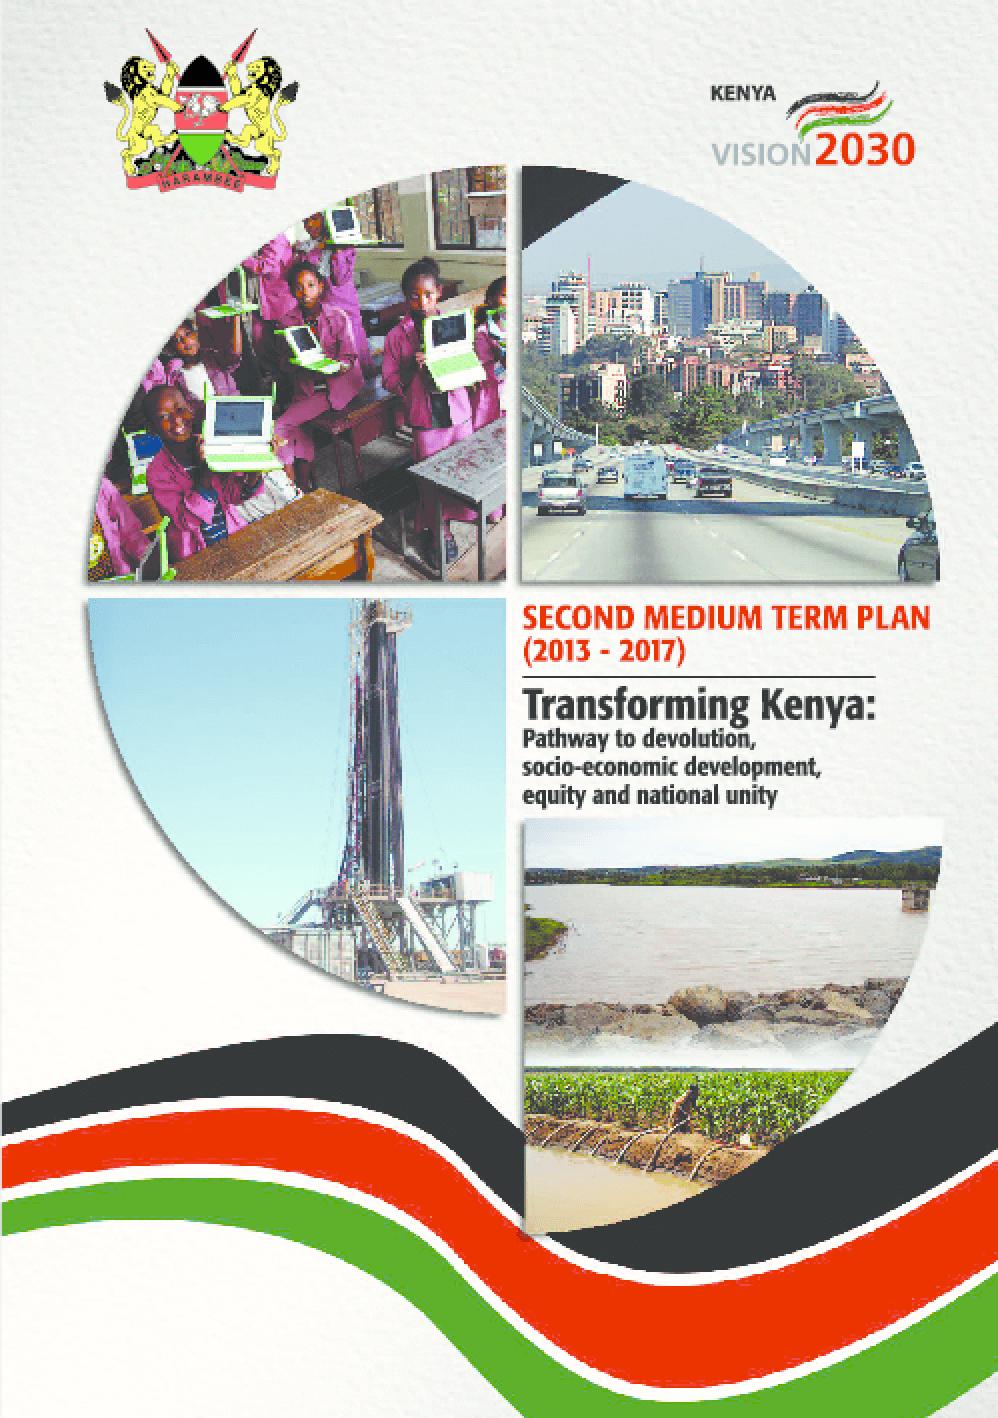 Second Medium Term Plan 2013-2017 Transforming Kenya: Pathway to Devolution, Socio-economic Development, Equity and National Unity